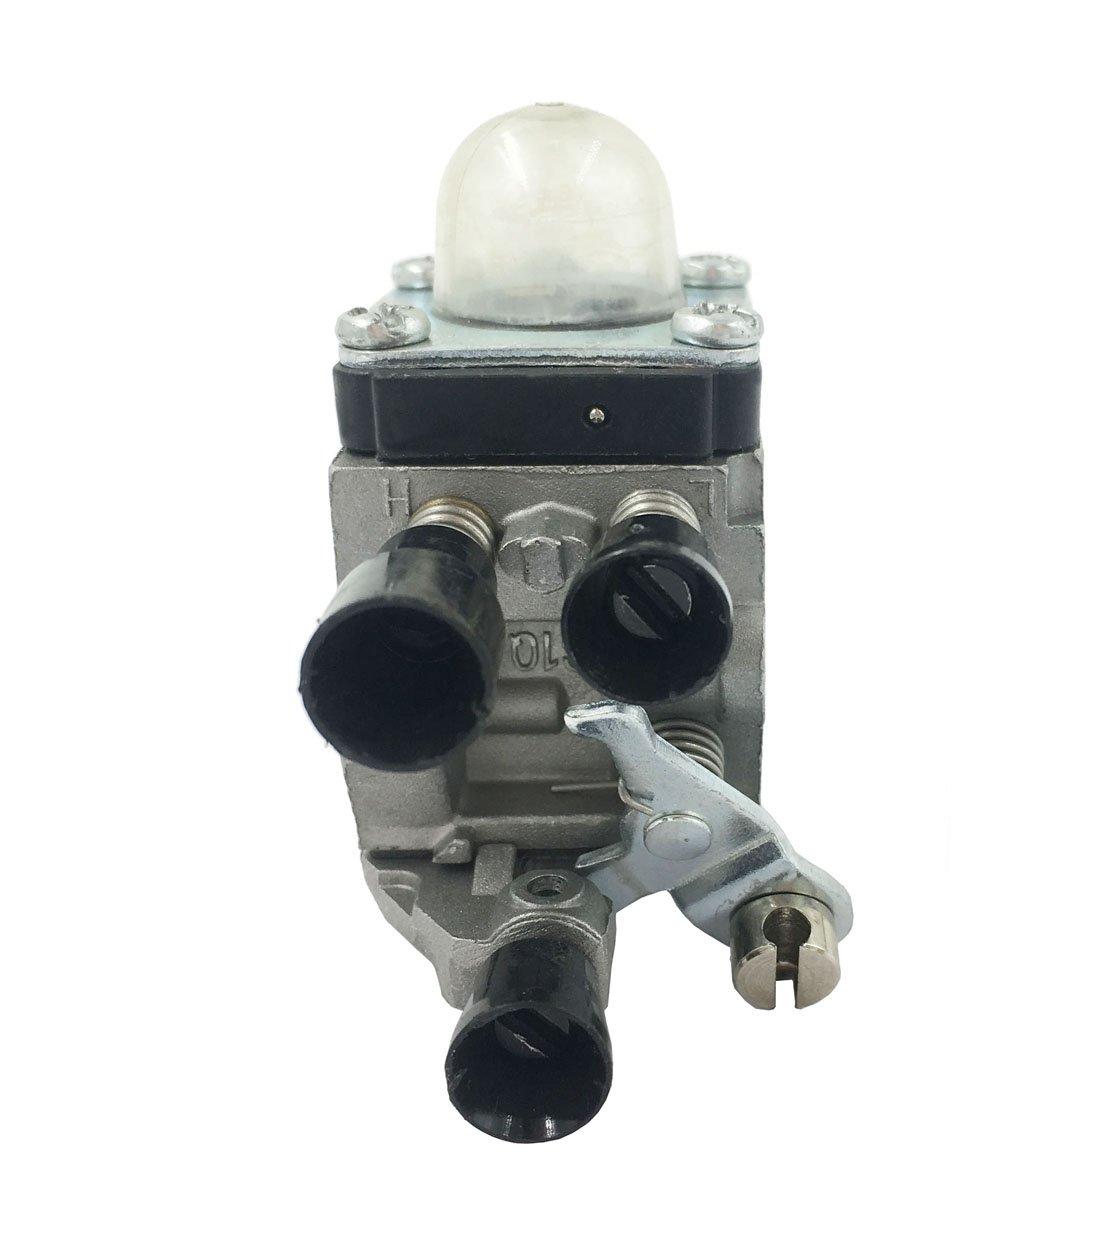 Amazon.com: Stihl fs80 Carburador – hooai FS75 fs80 Fs85 ...